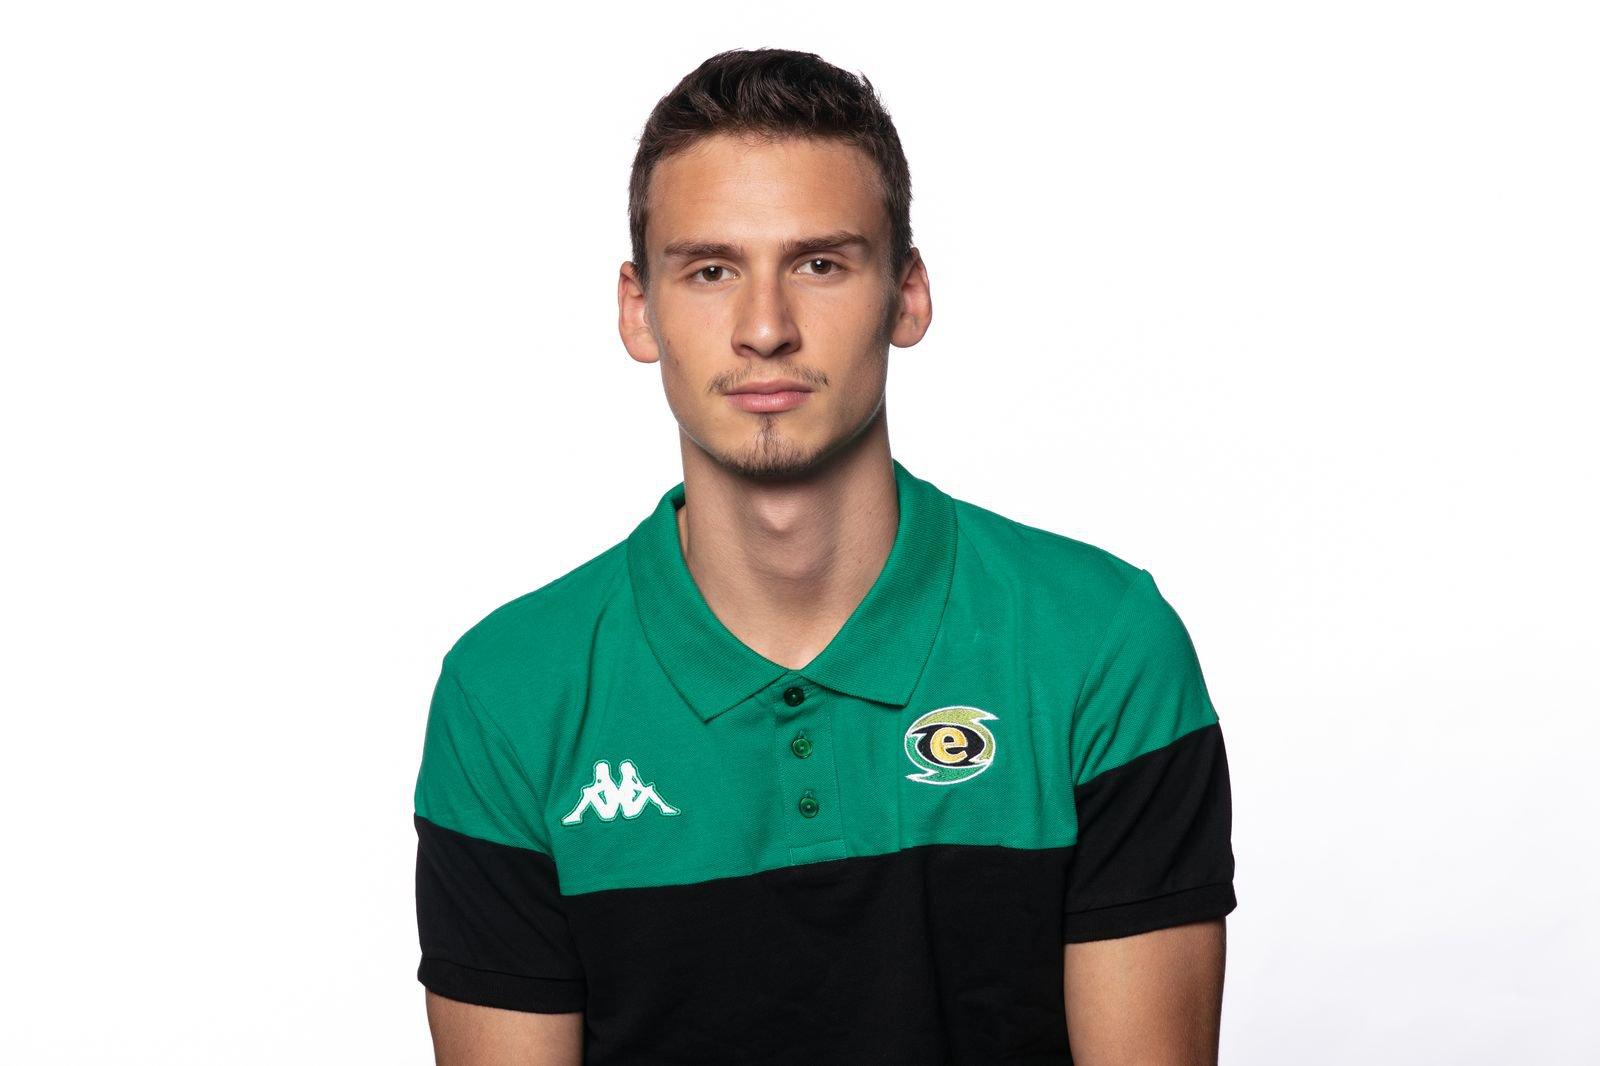 Filip Bernáth